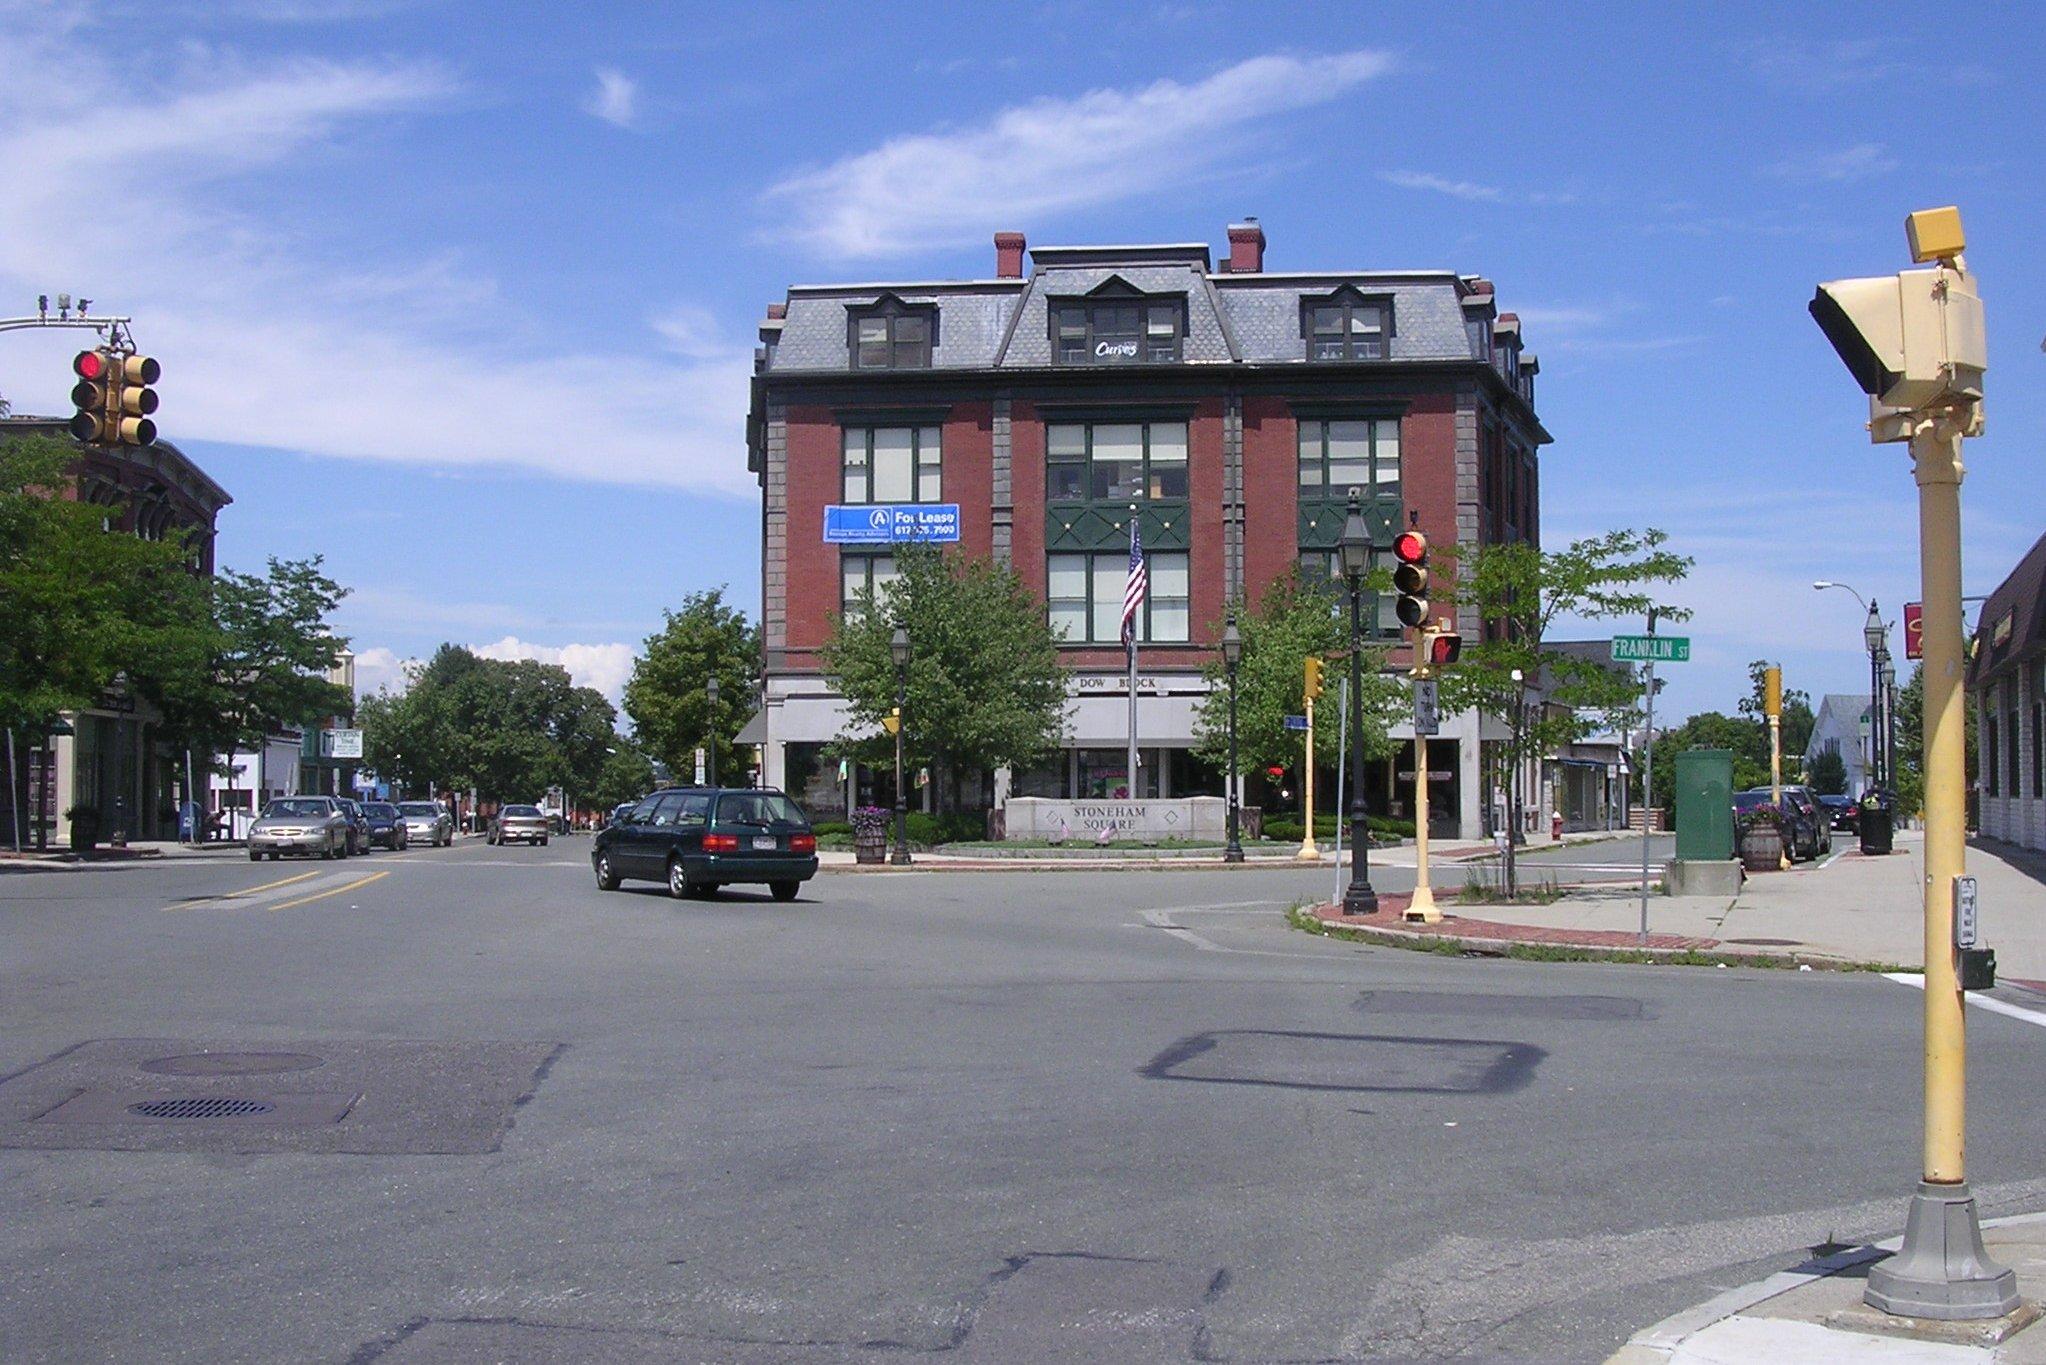 File:Dow Block, Stoneham MA.jpg - Wikimedia Commons